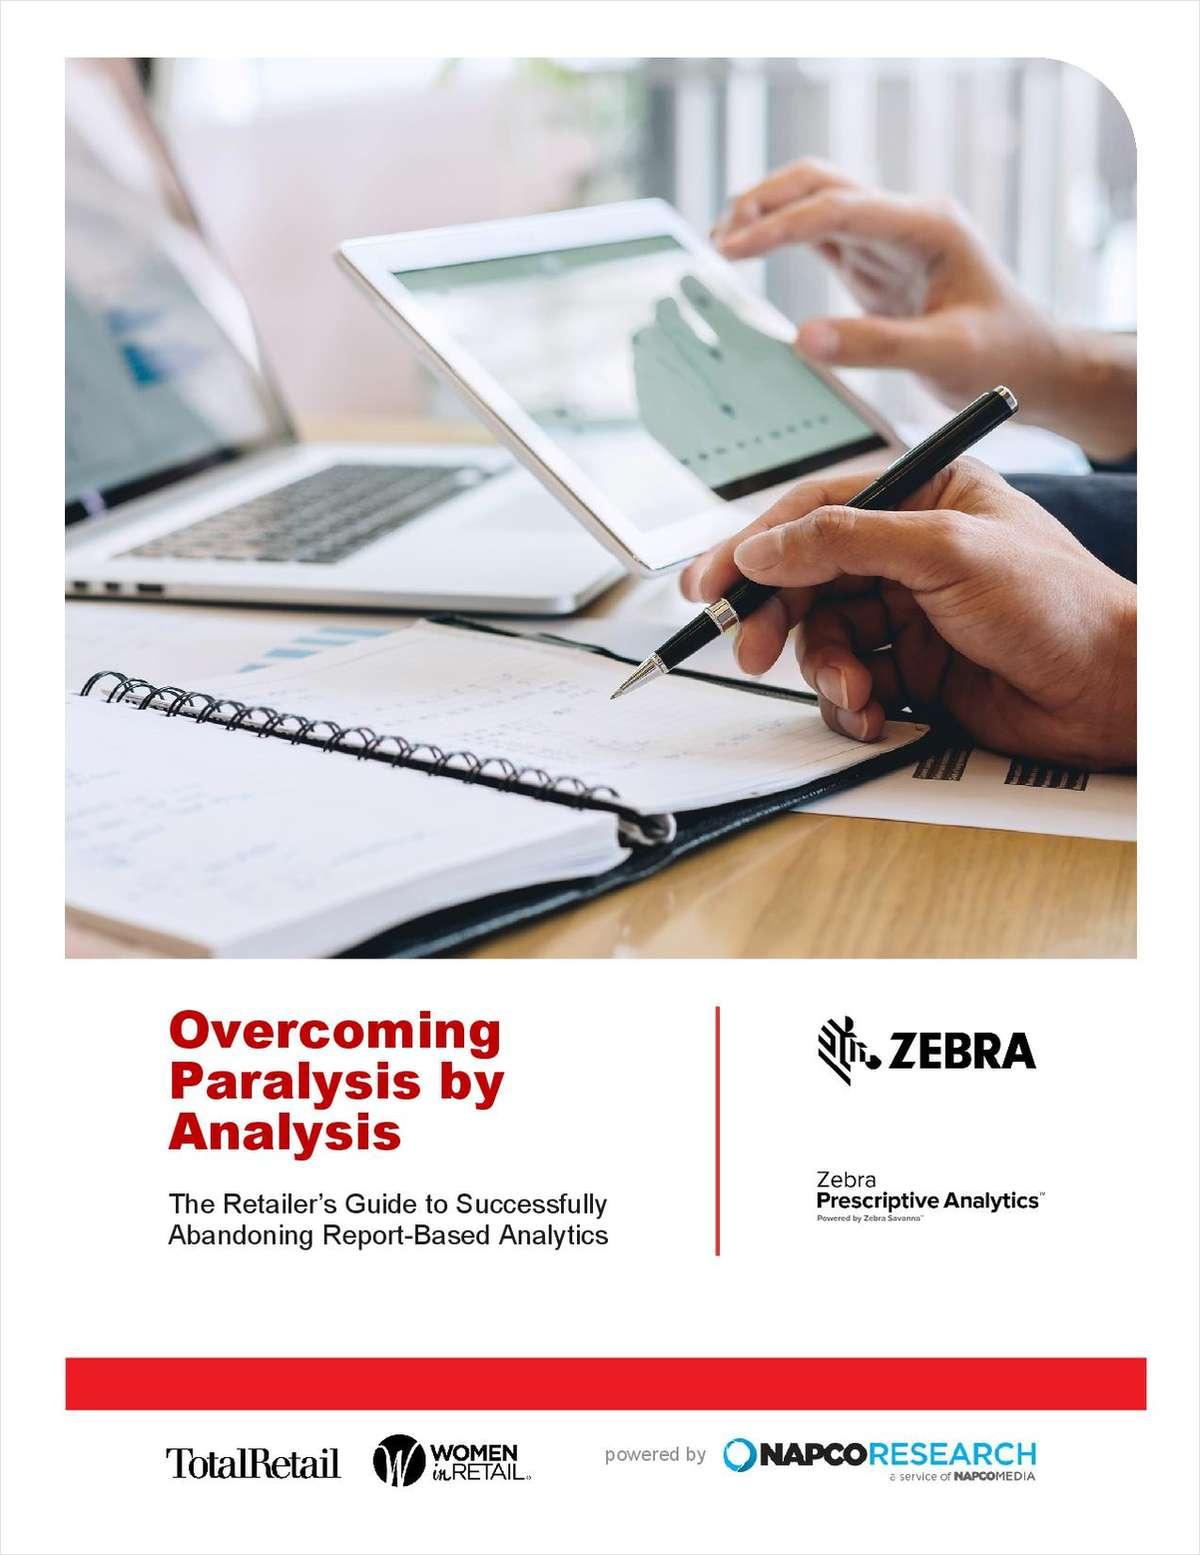 Overcoming Paralysis by Analysis